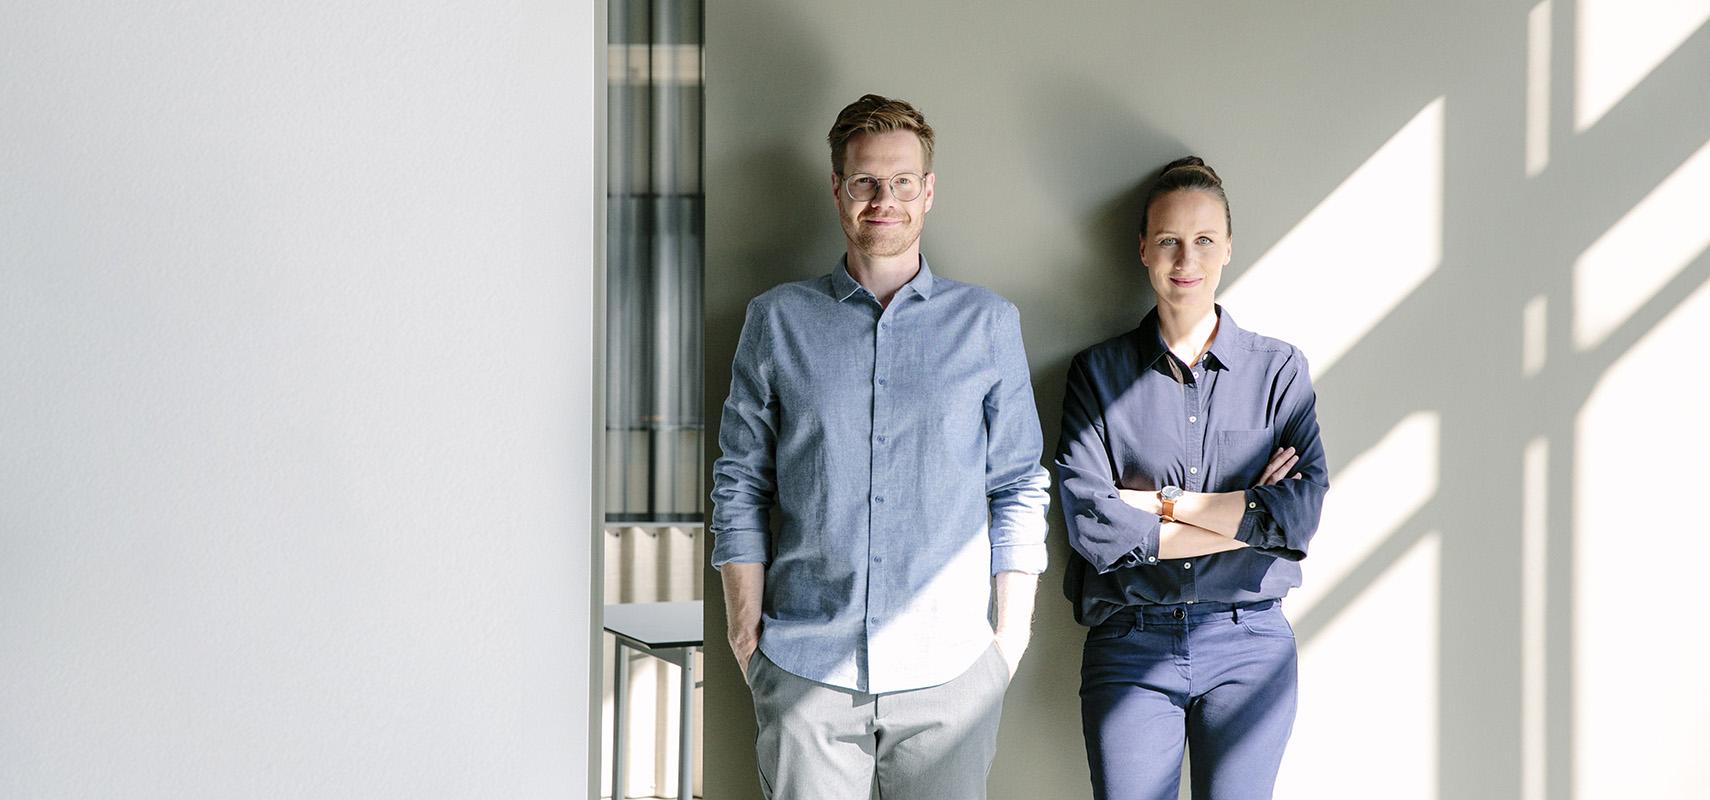 Magazin, Gestaltung, Köln, Start